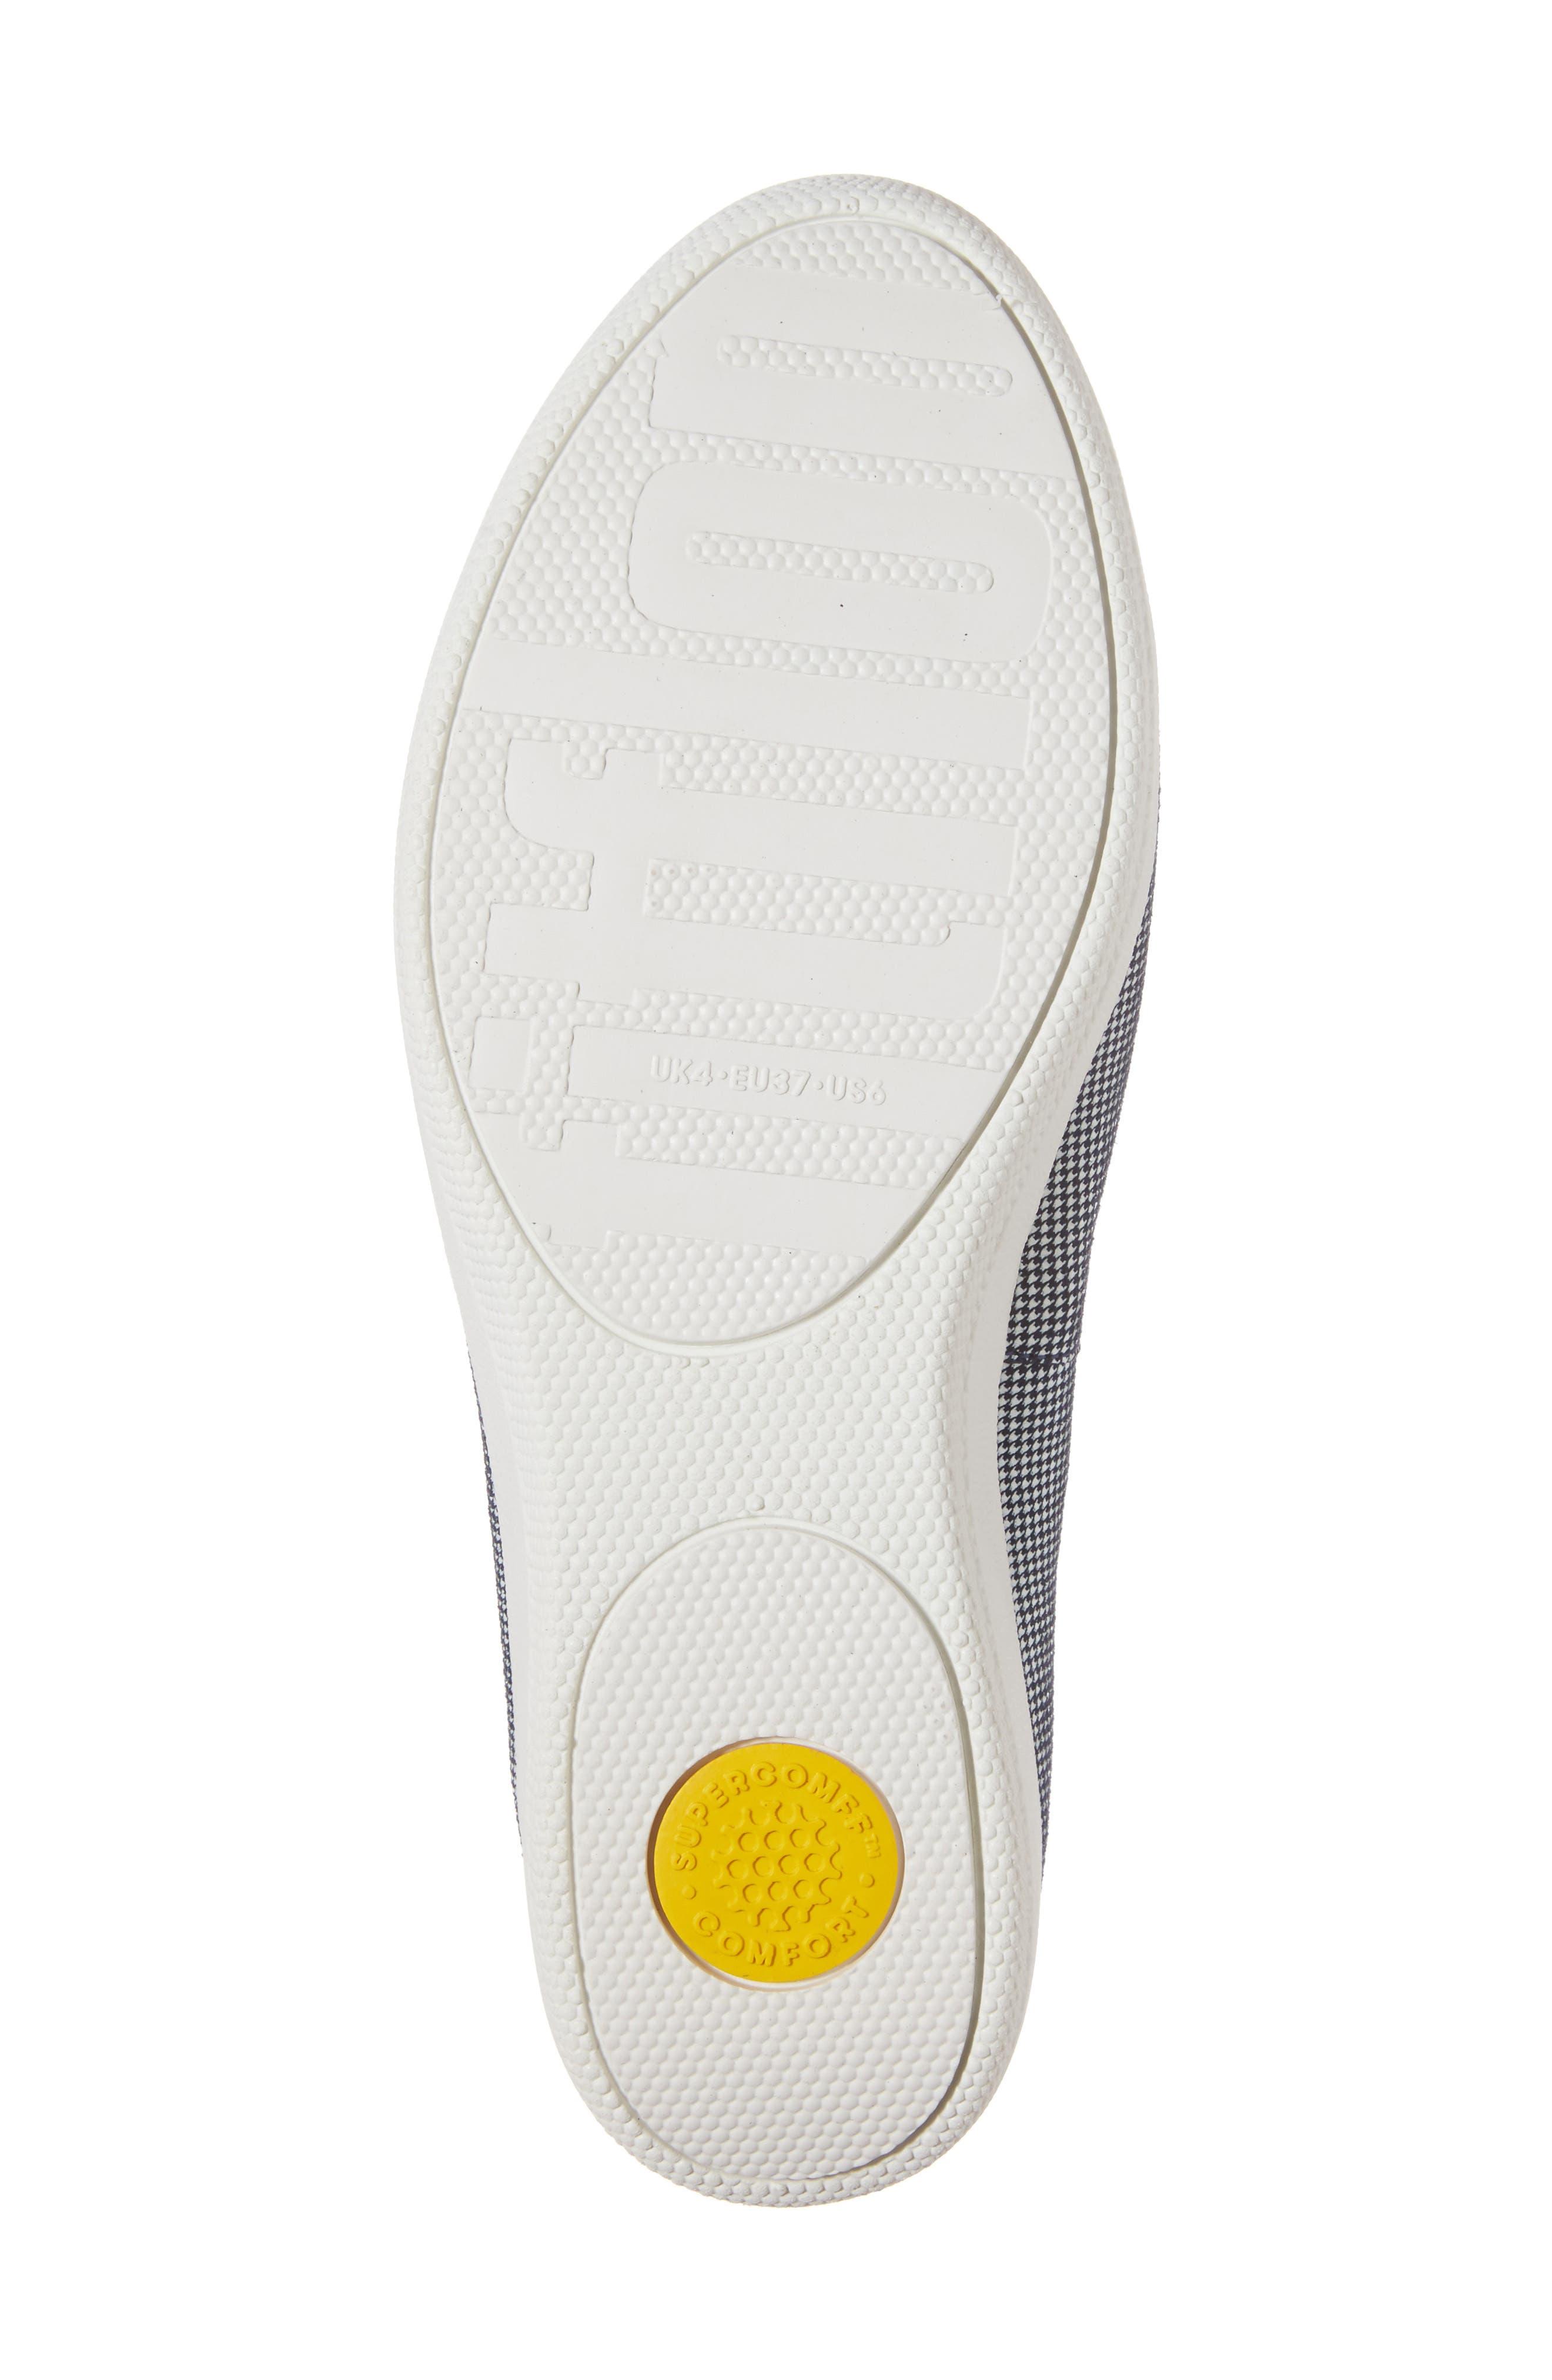 Houndstooth Superskate Sneaker,                             Alternate thumbnail 23, color,